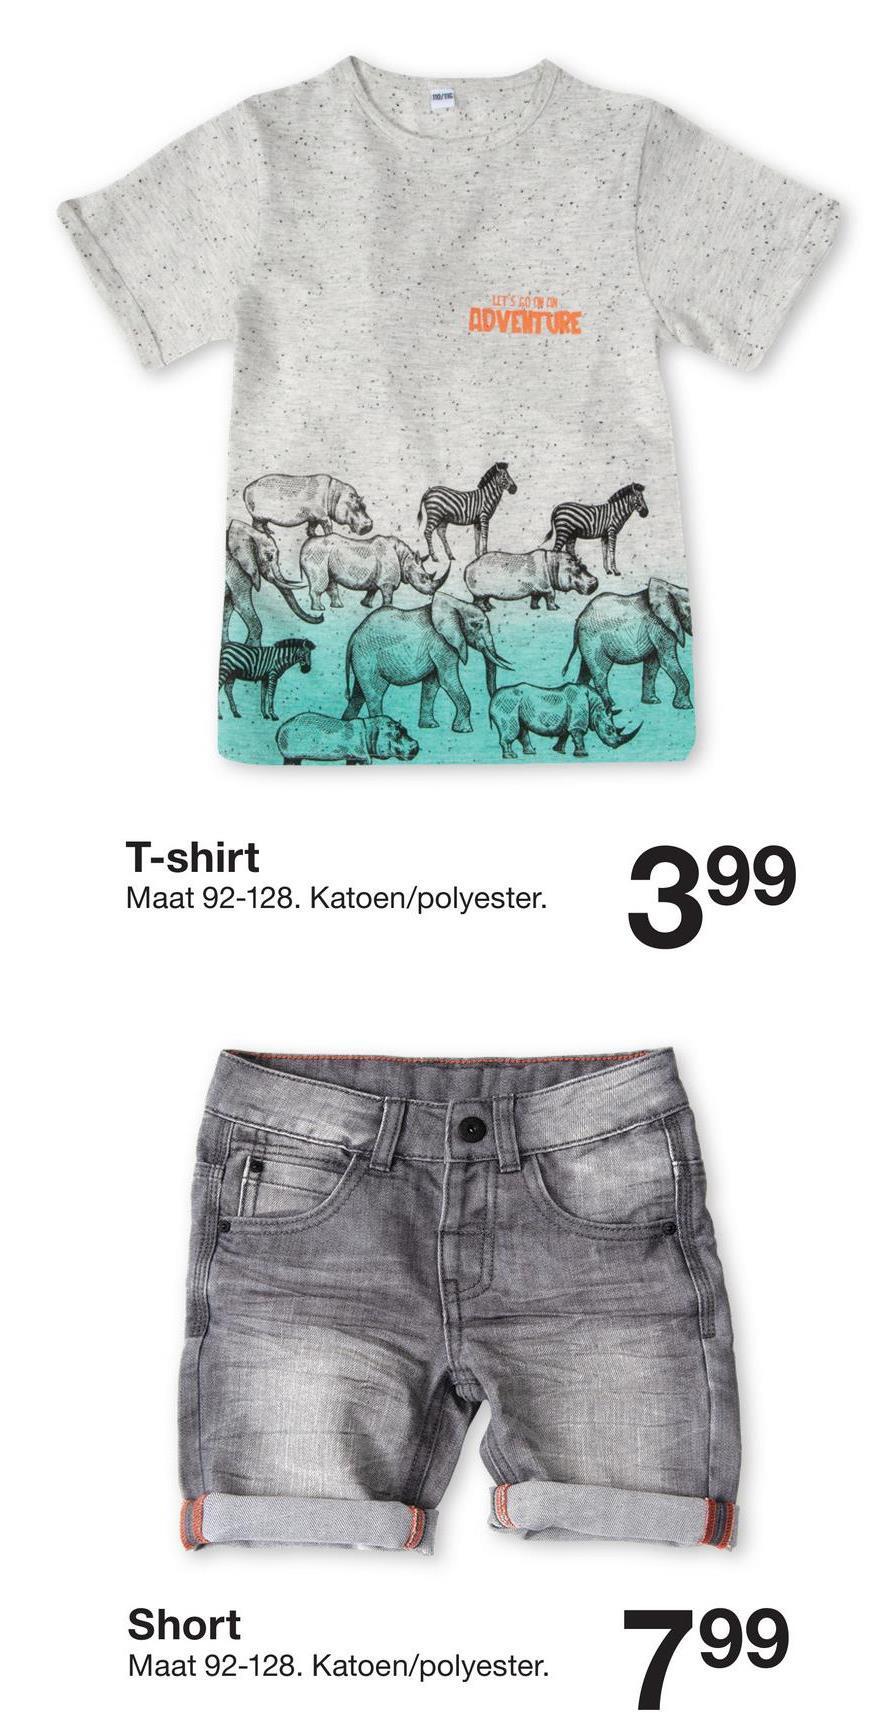 ROVE TUR T-shirt Maat 92-128. Katoen/polyester. mashartno. Katoenpolyester. 399 Short Maat 92-128. Katoen/polyester.